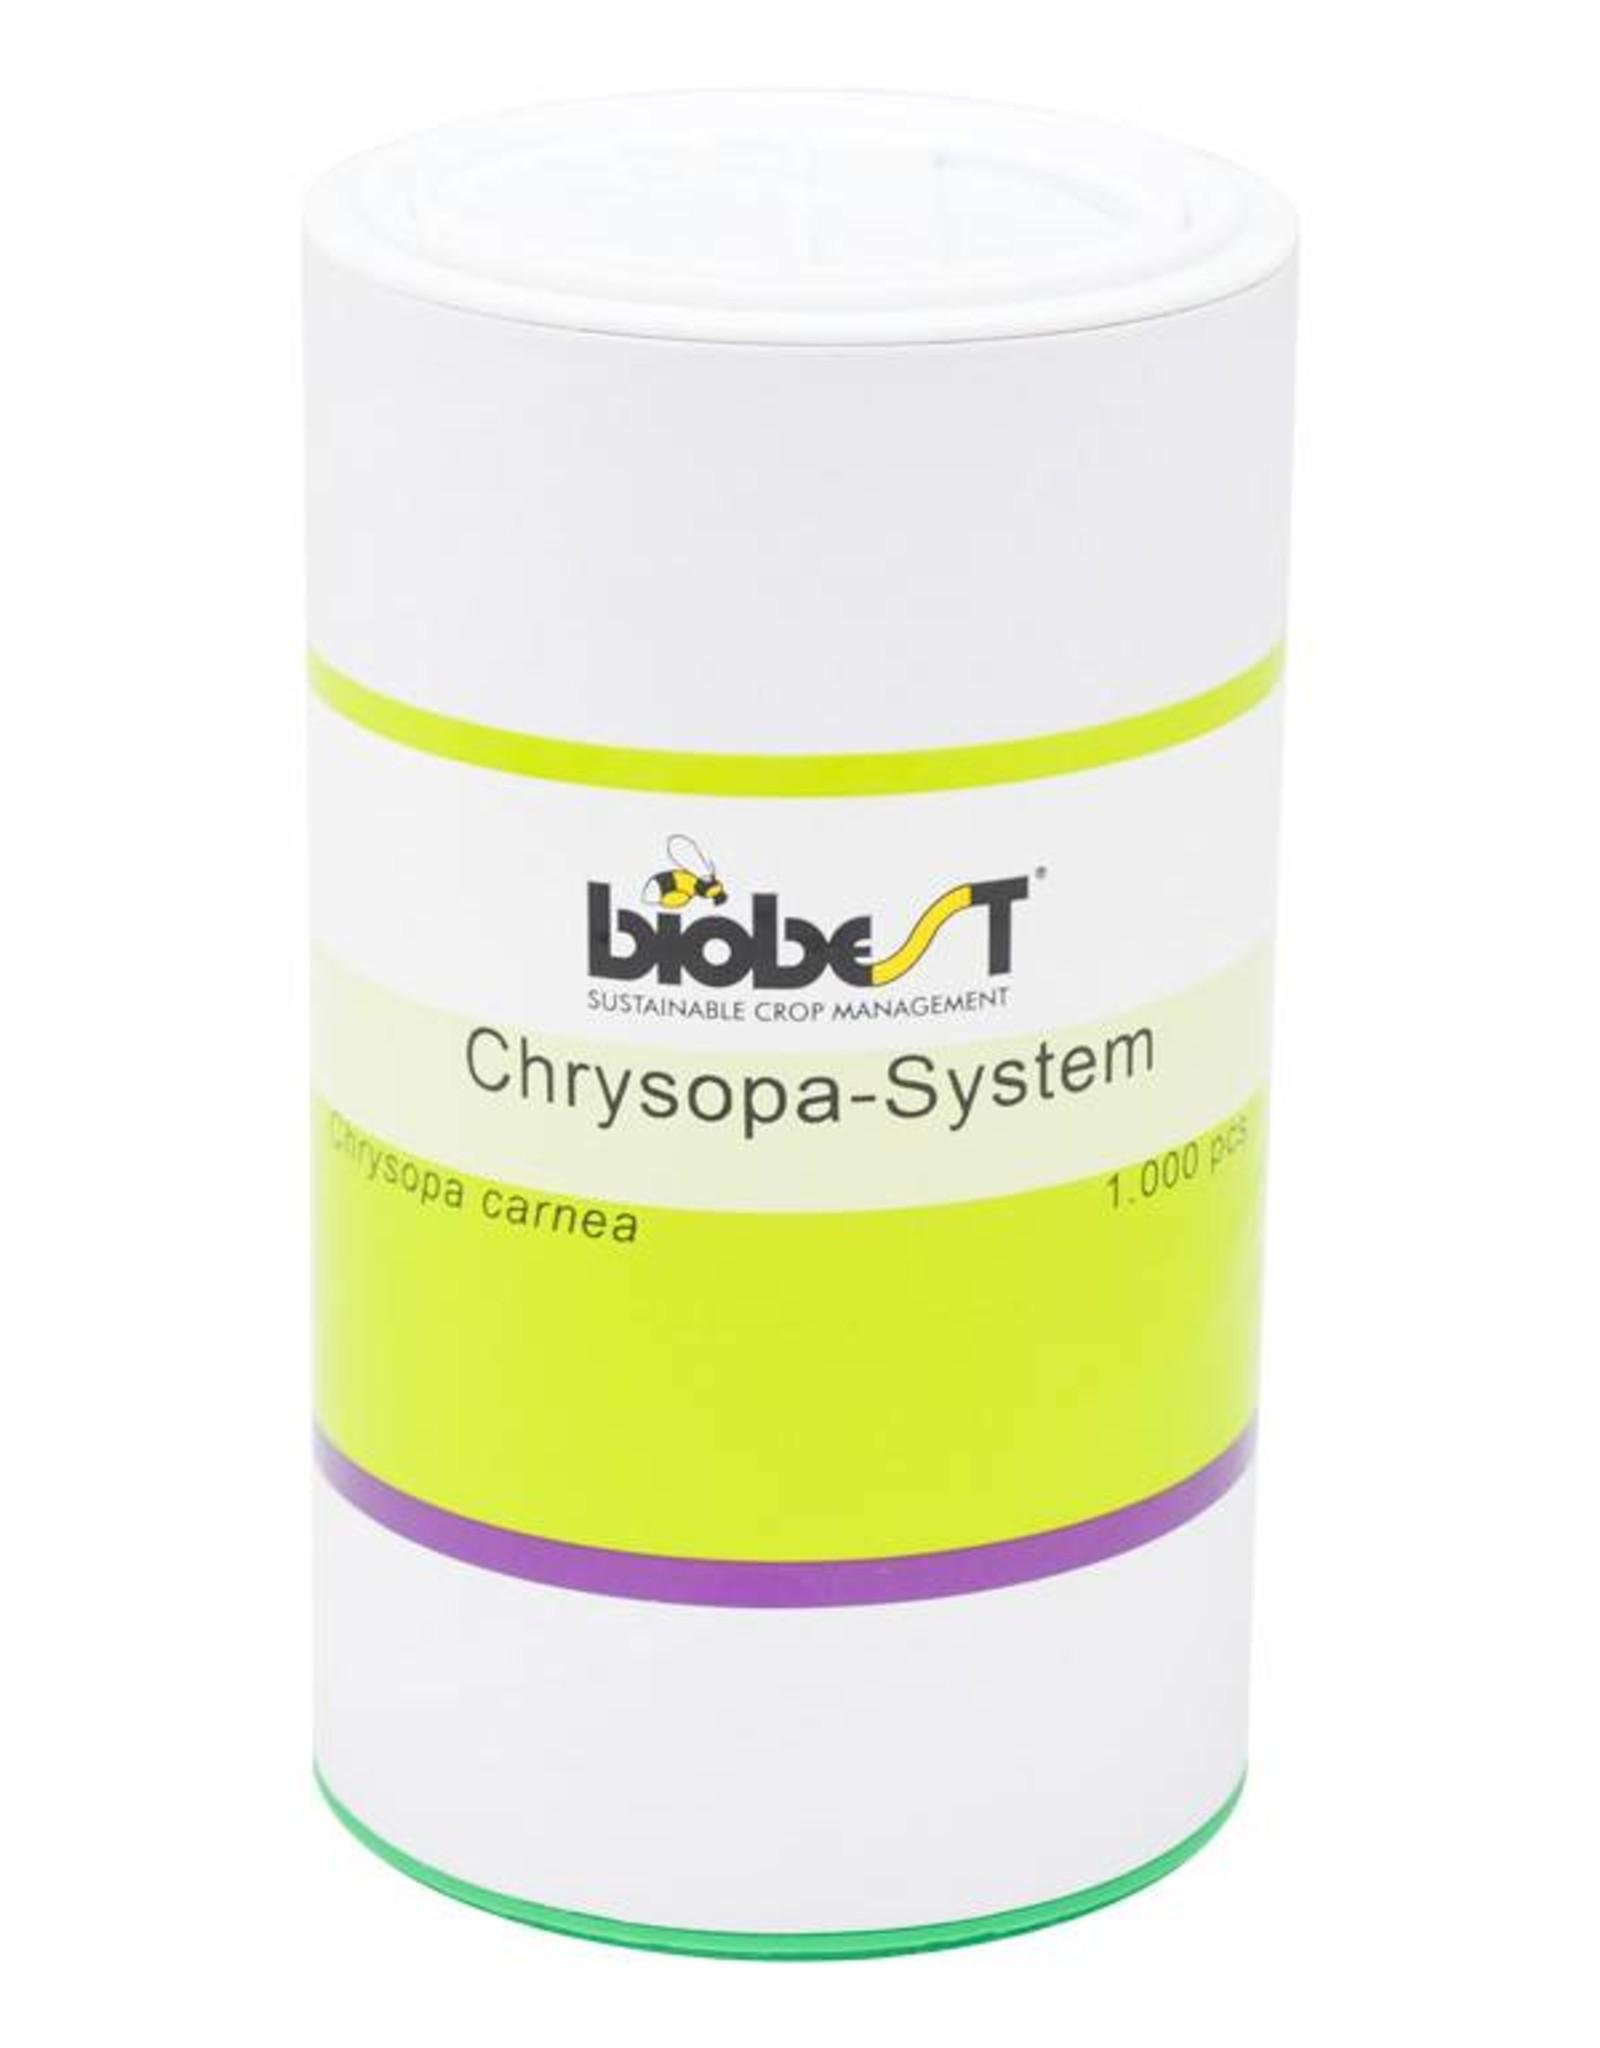 Brimex Biobest Bladluis bestrijden met gaasvlieg Chrysopa